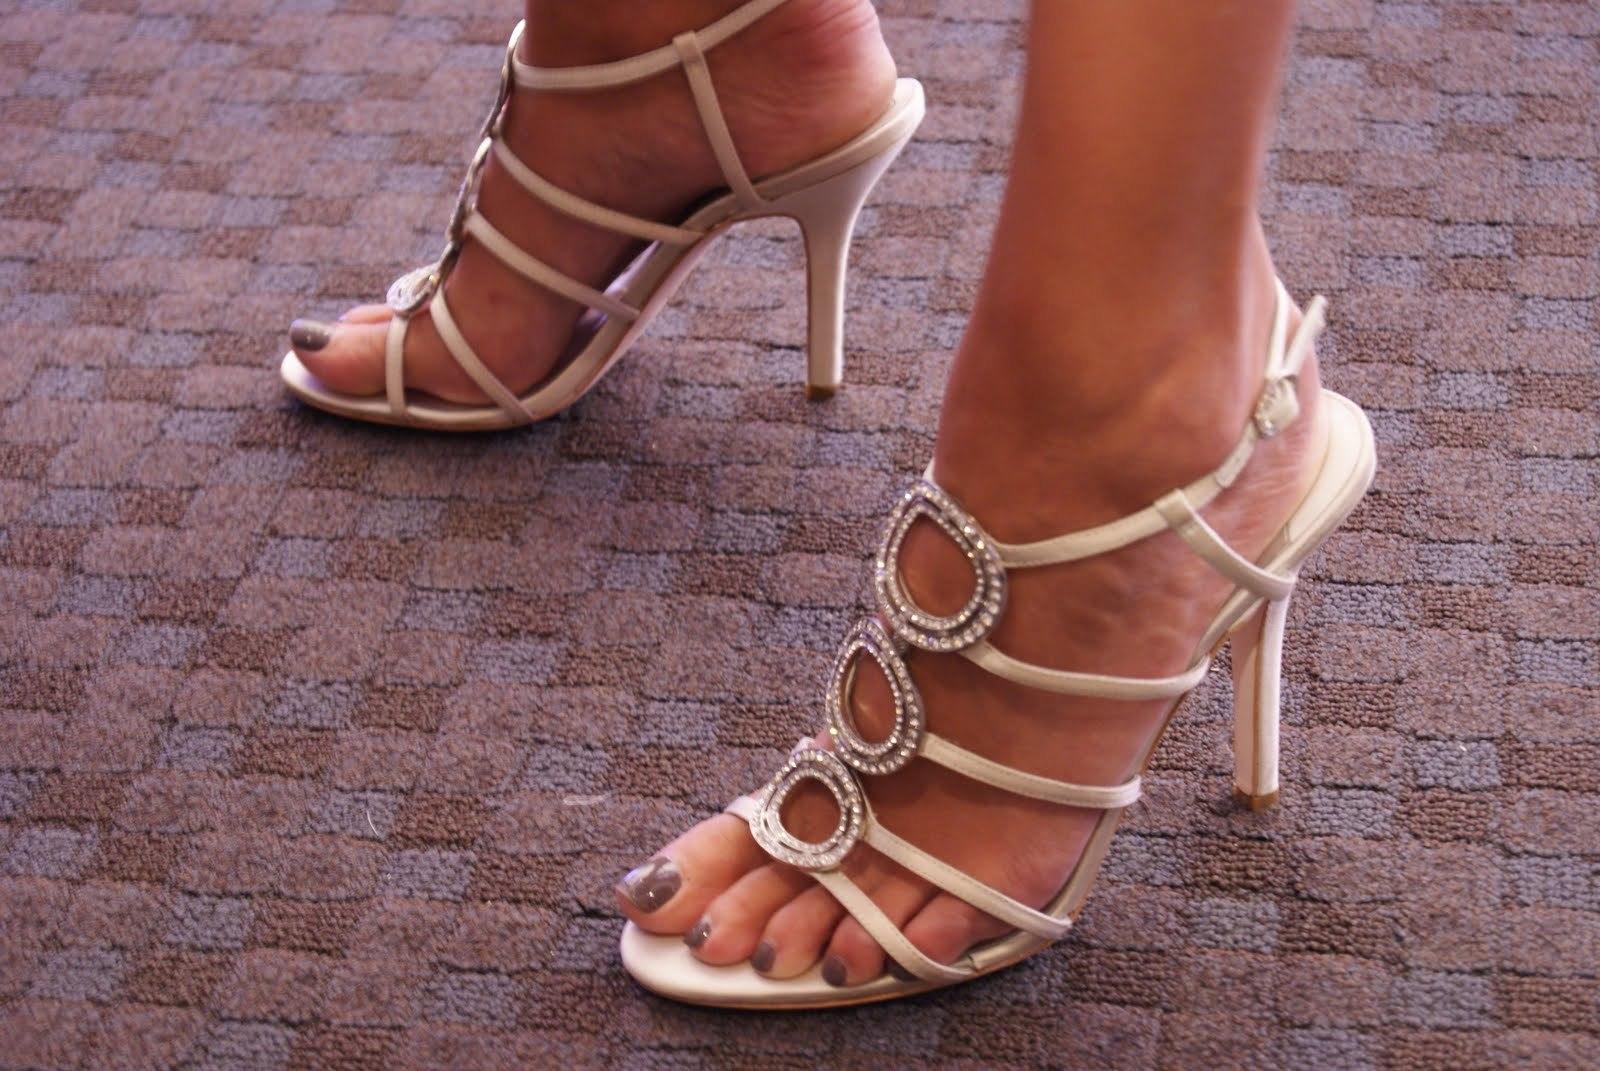 Pretty Feet Cock 31